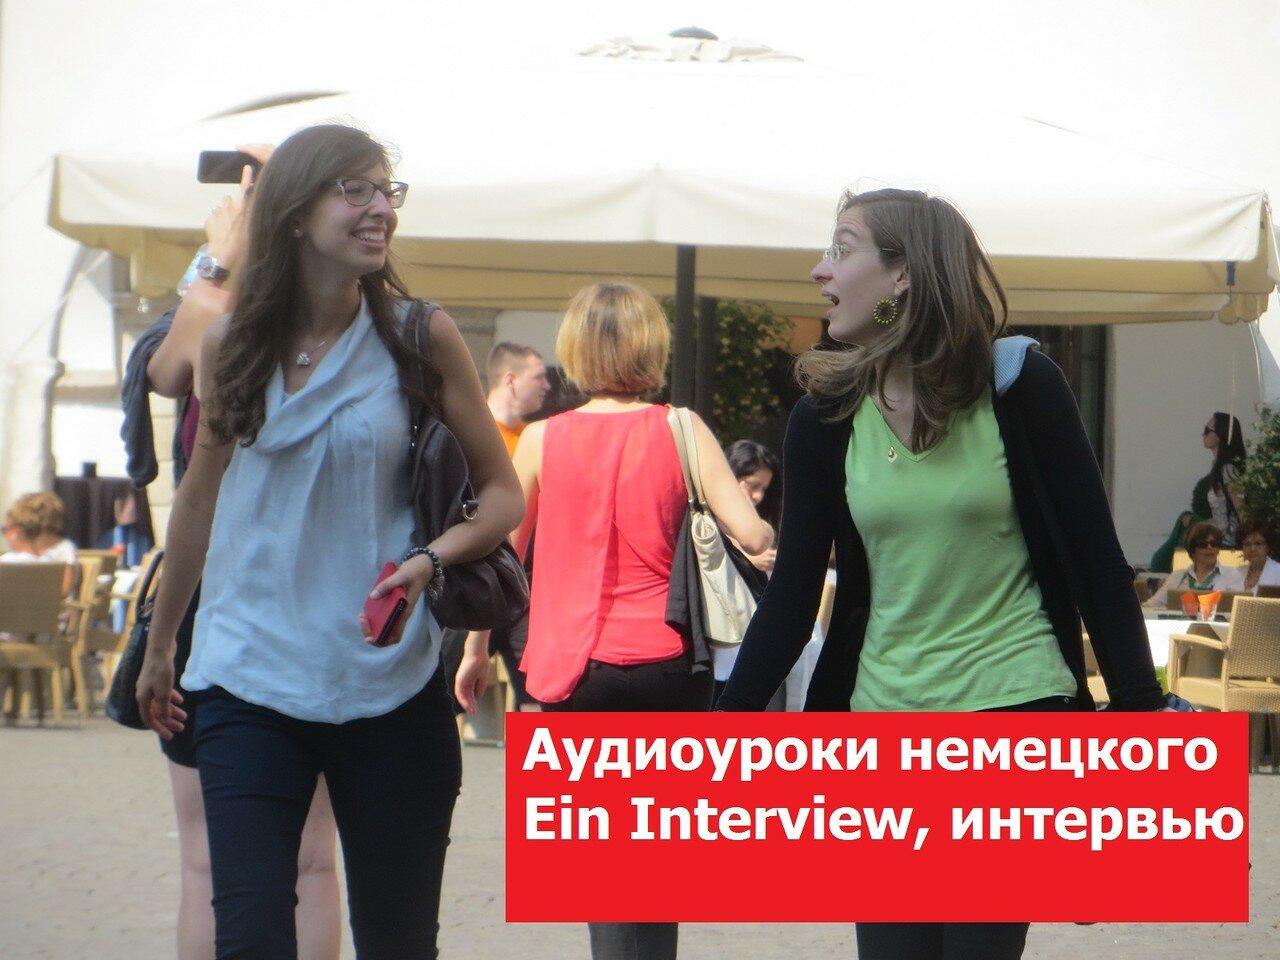 Аудиоуроки немецкого языка. Урок 032. Ein Interview, Интервью